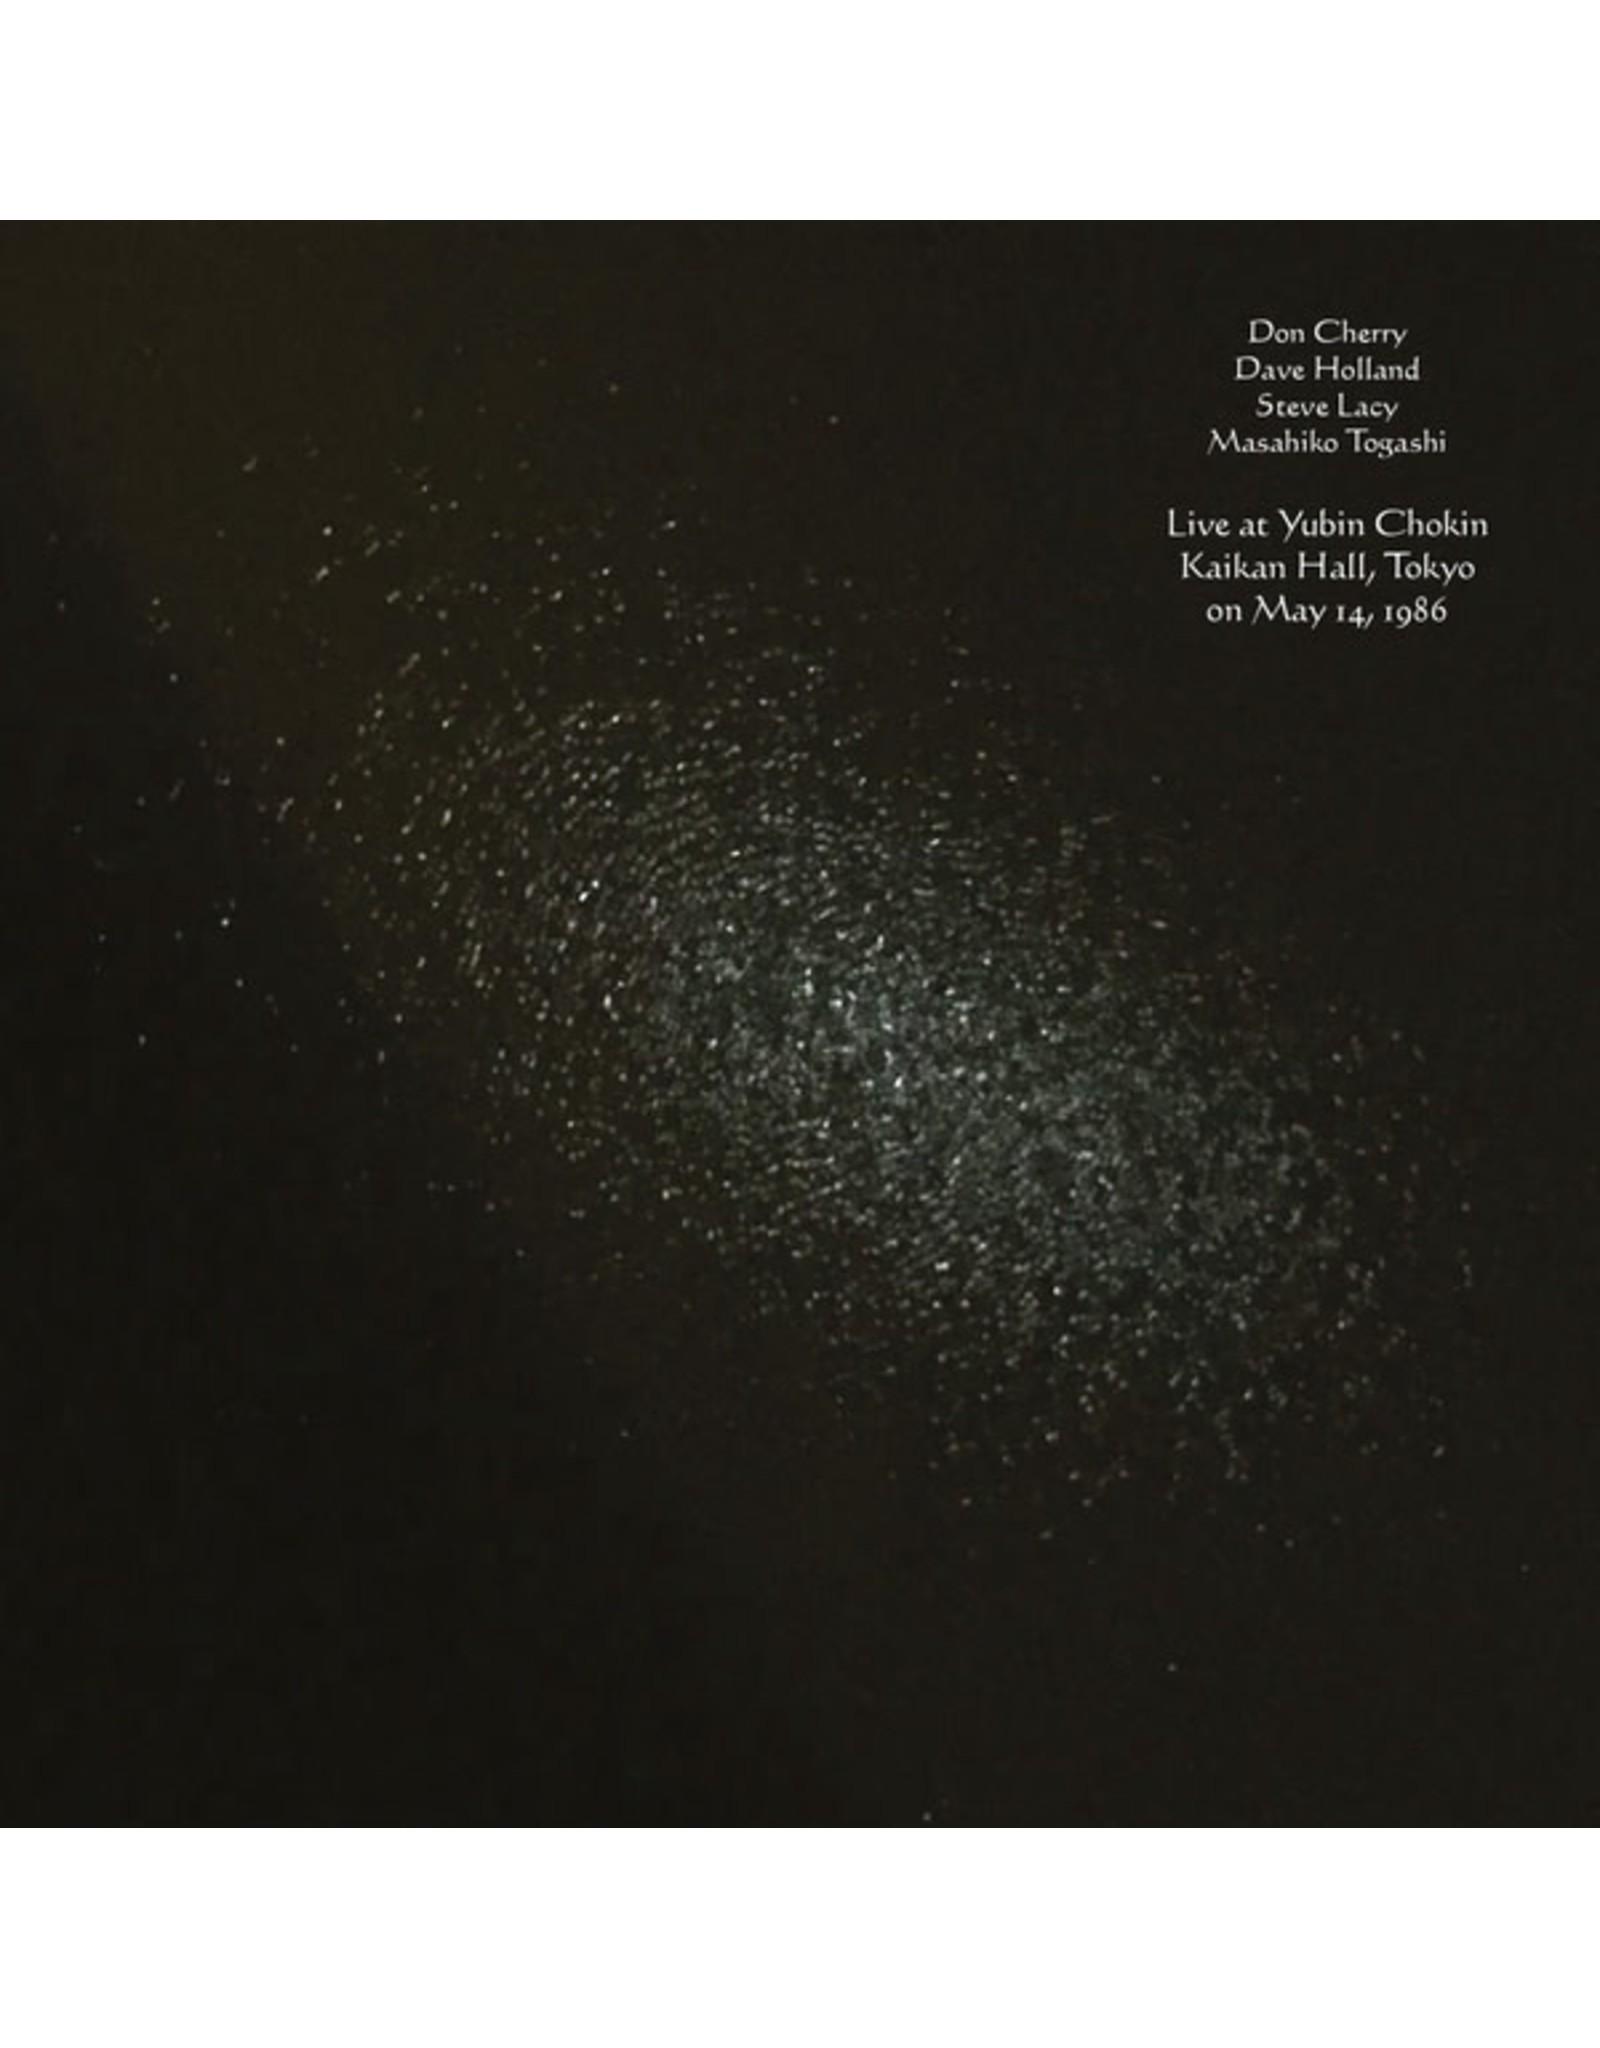 Victory Masahiko Togashi/Steve Lacy/Don Cherry/ Dave Holland: Live at Yonin Chokin Kaikan Hall LP